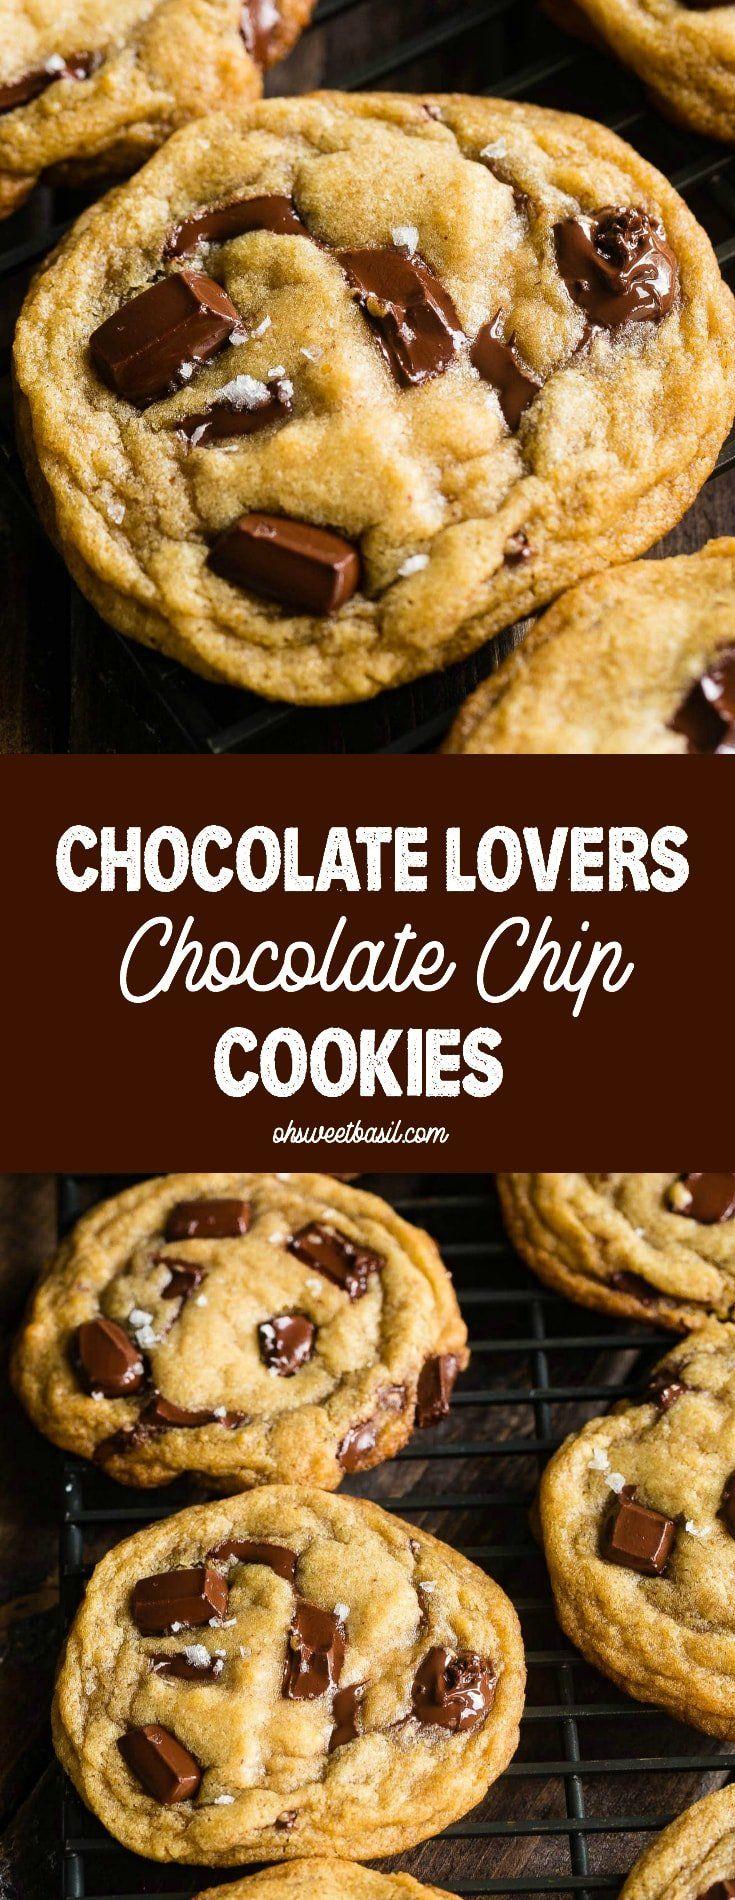 Chocolate Lovers Chocolate Chip Cookies - Oh Sweet Basil